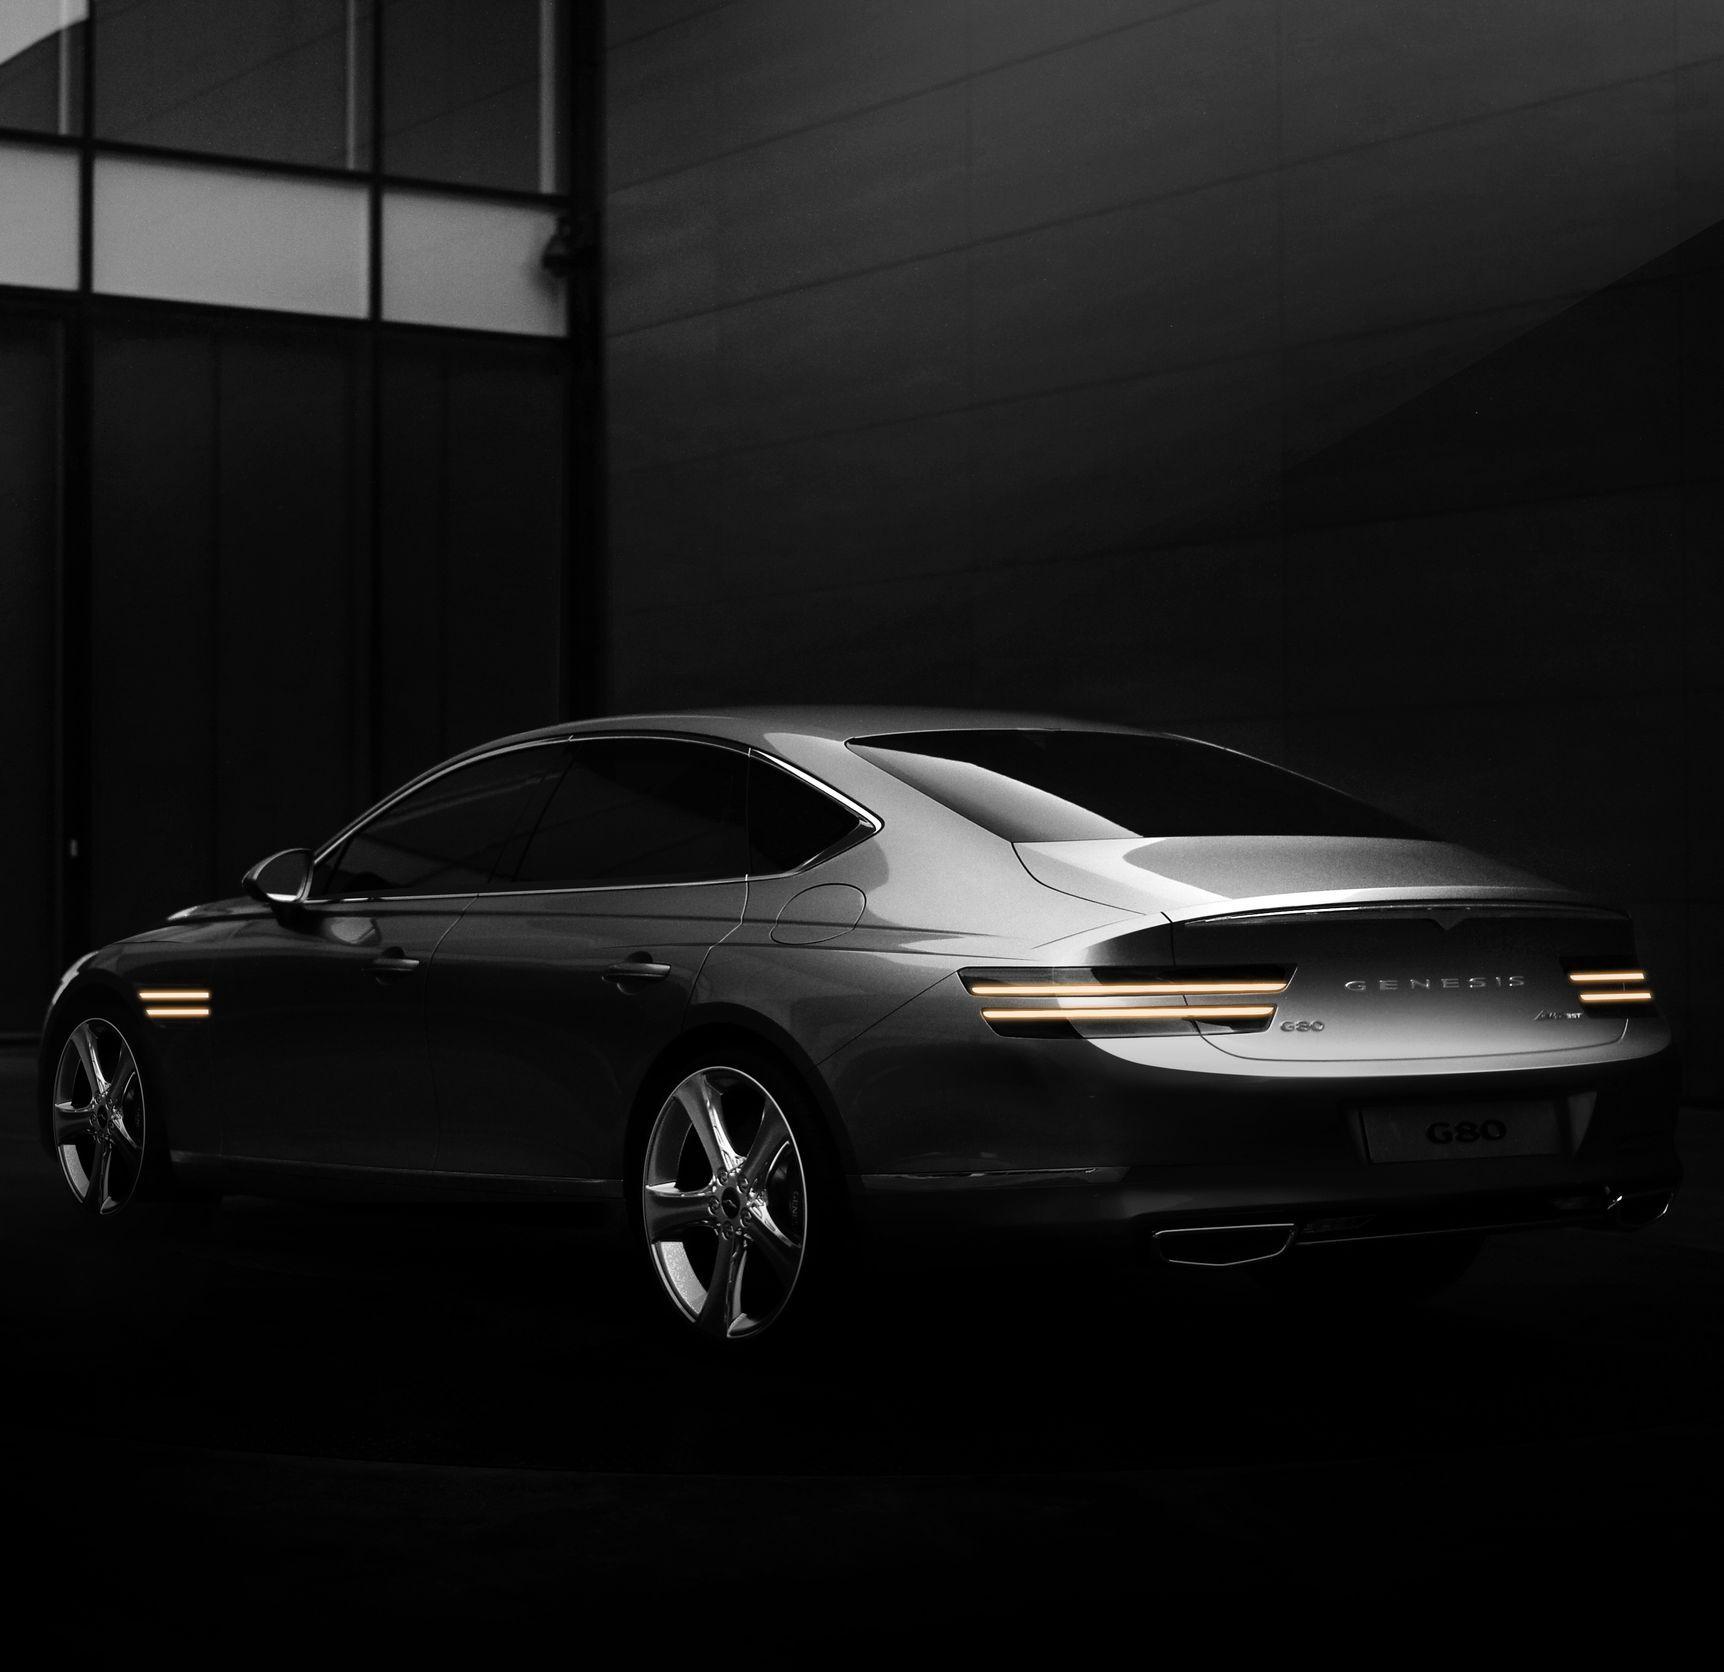 Erste Bilder OberklasseLimousine Genesis G80 in 2020 E